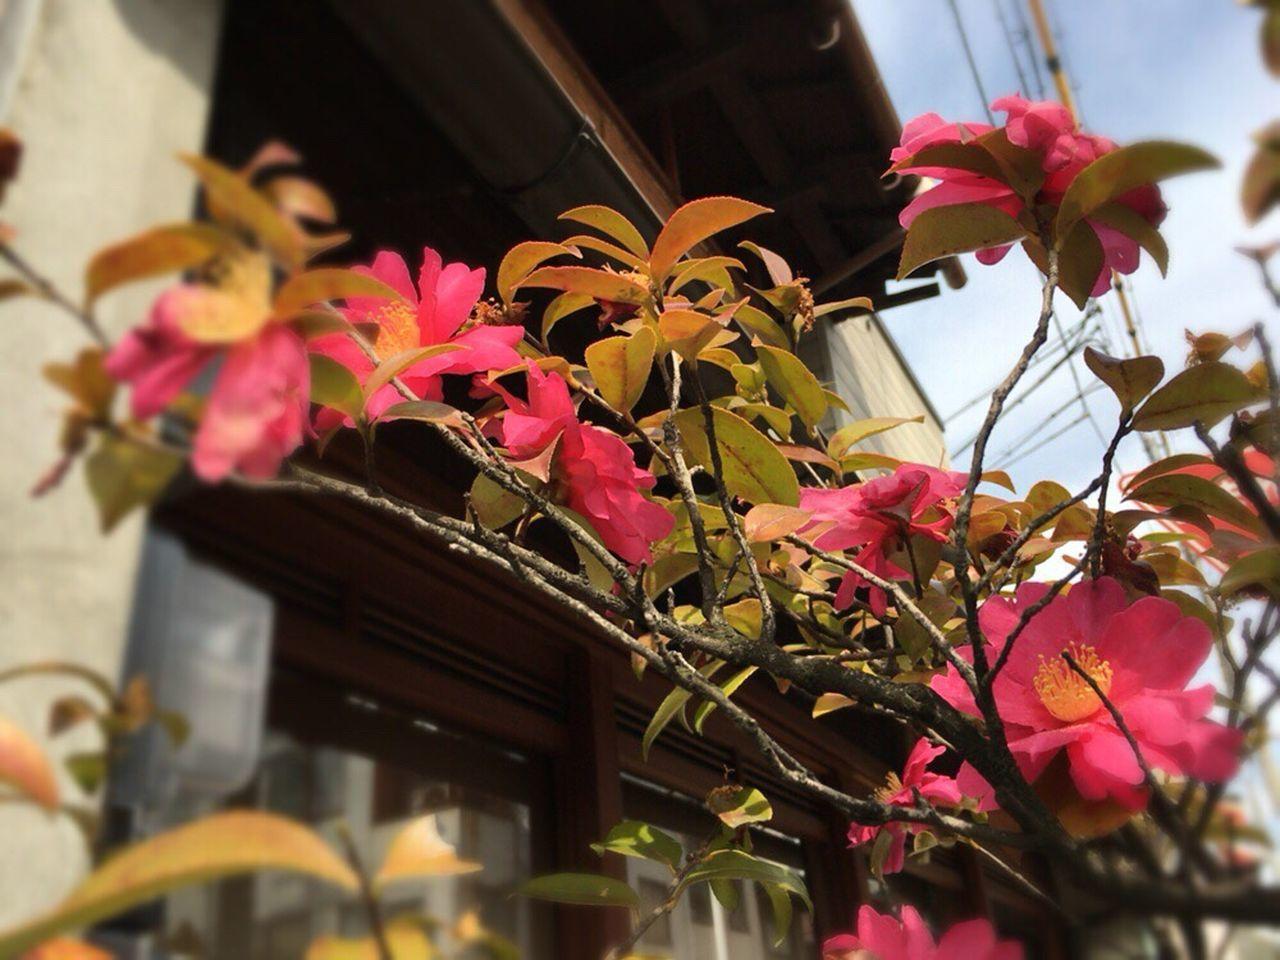 Kyoto Street Kyoto,japan Kyoto City Kyoto Street Flower Kyoto Matiya Camellia Sasanqua